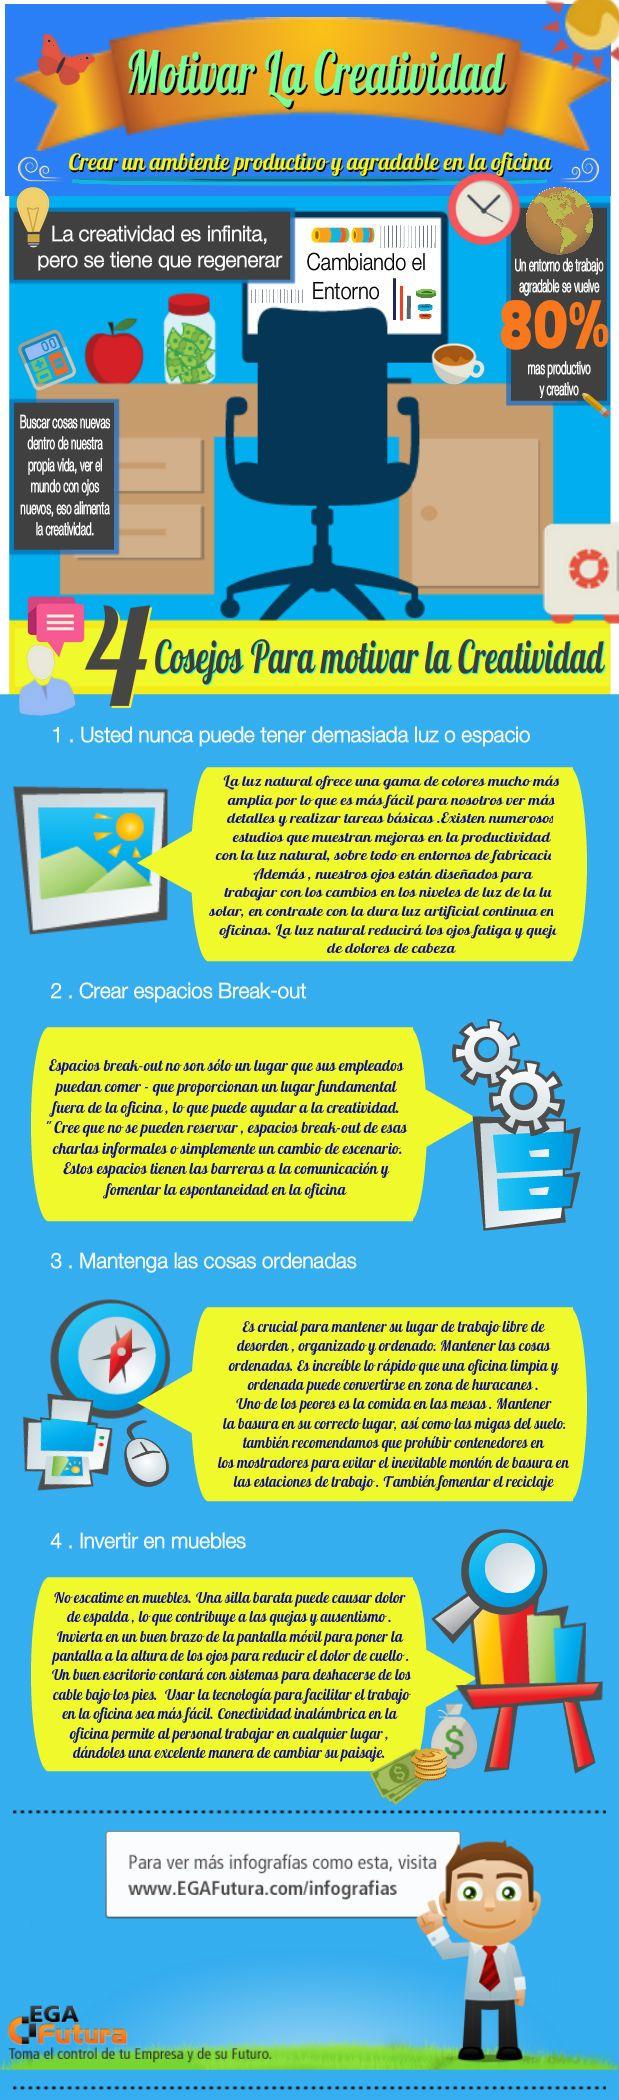 Motivar la creatividad desde la oficina! #infografia